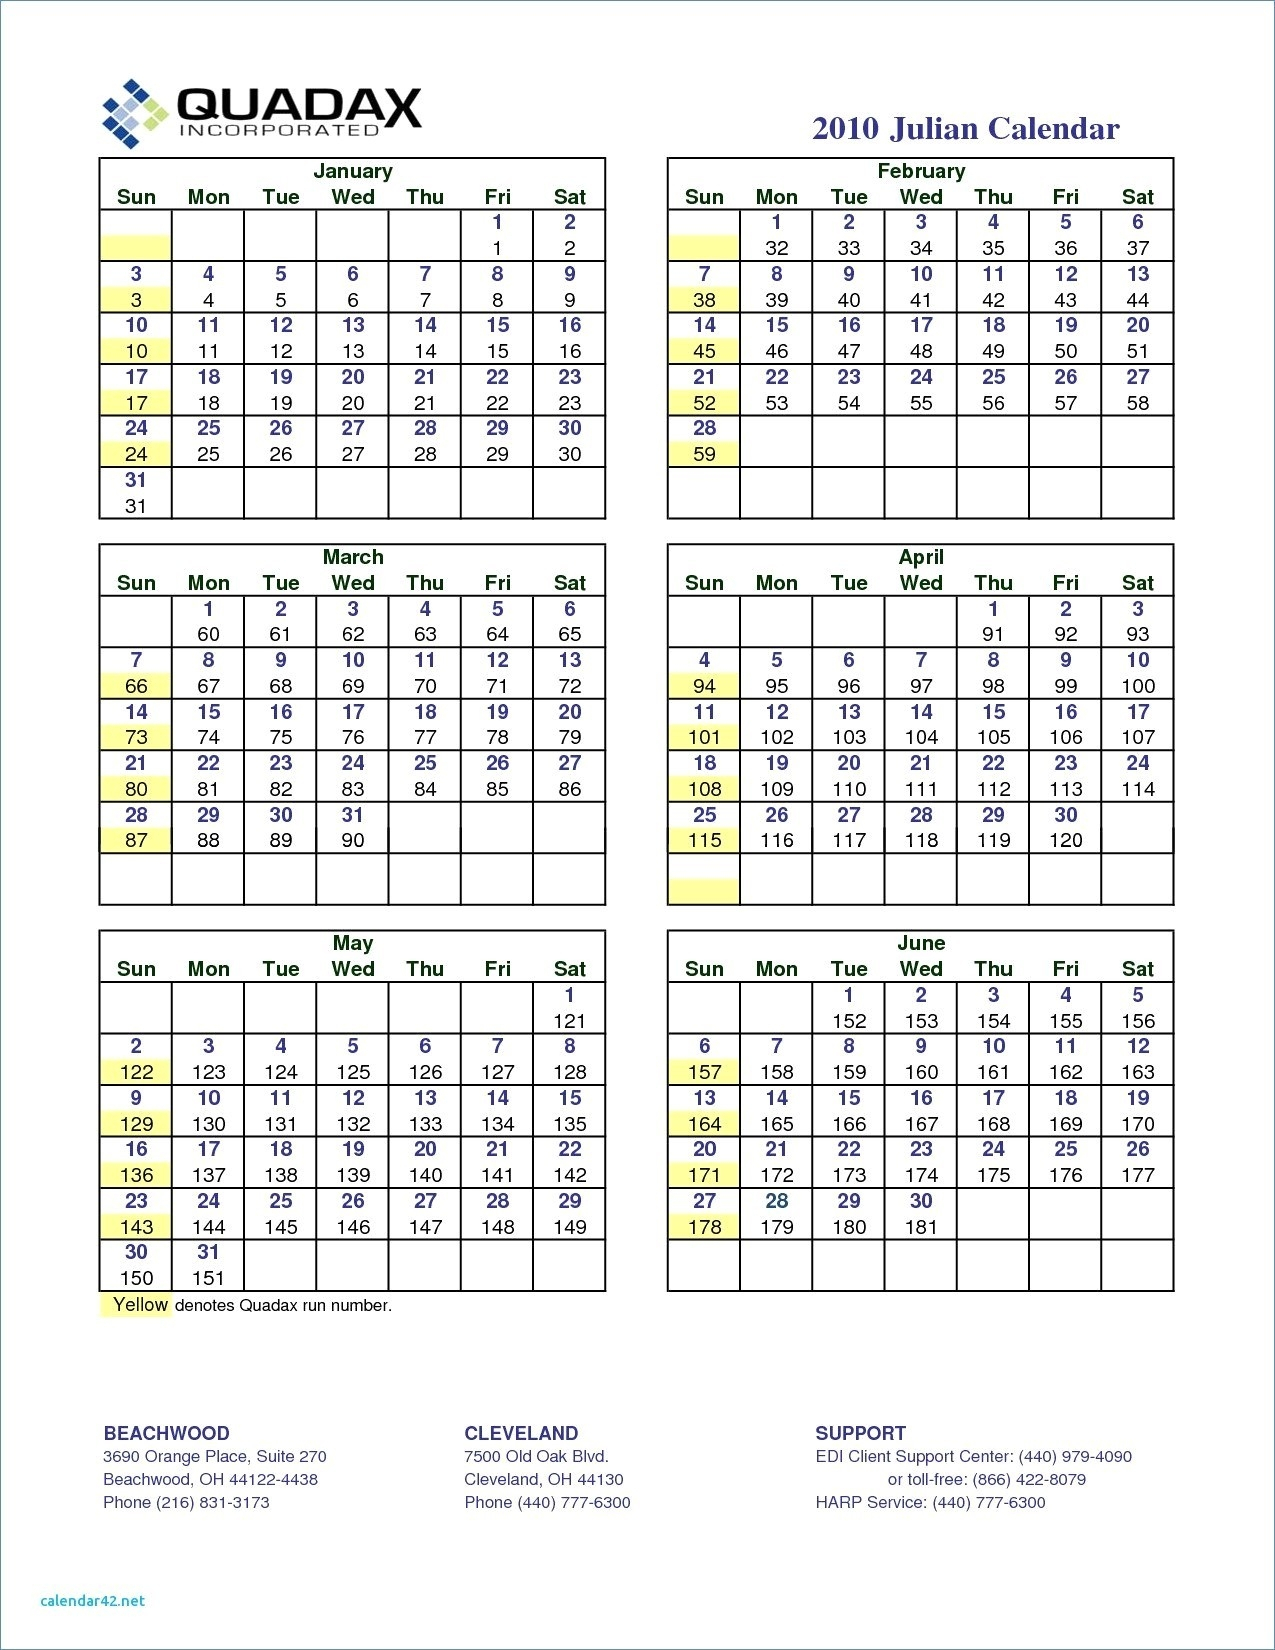 Quadax Julian Calendar 2020 Pdf | Example Calendar Printable in Quadax Julian Calendar 2020